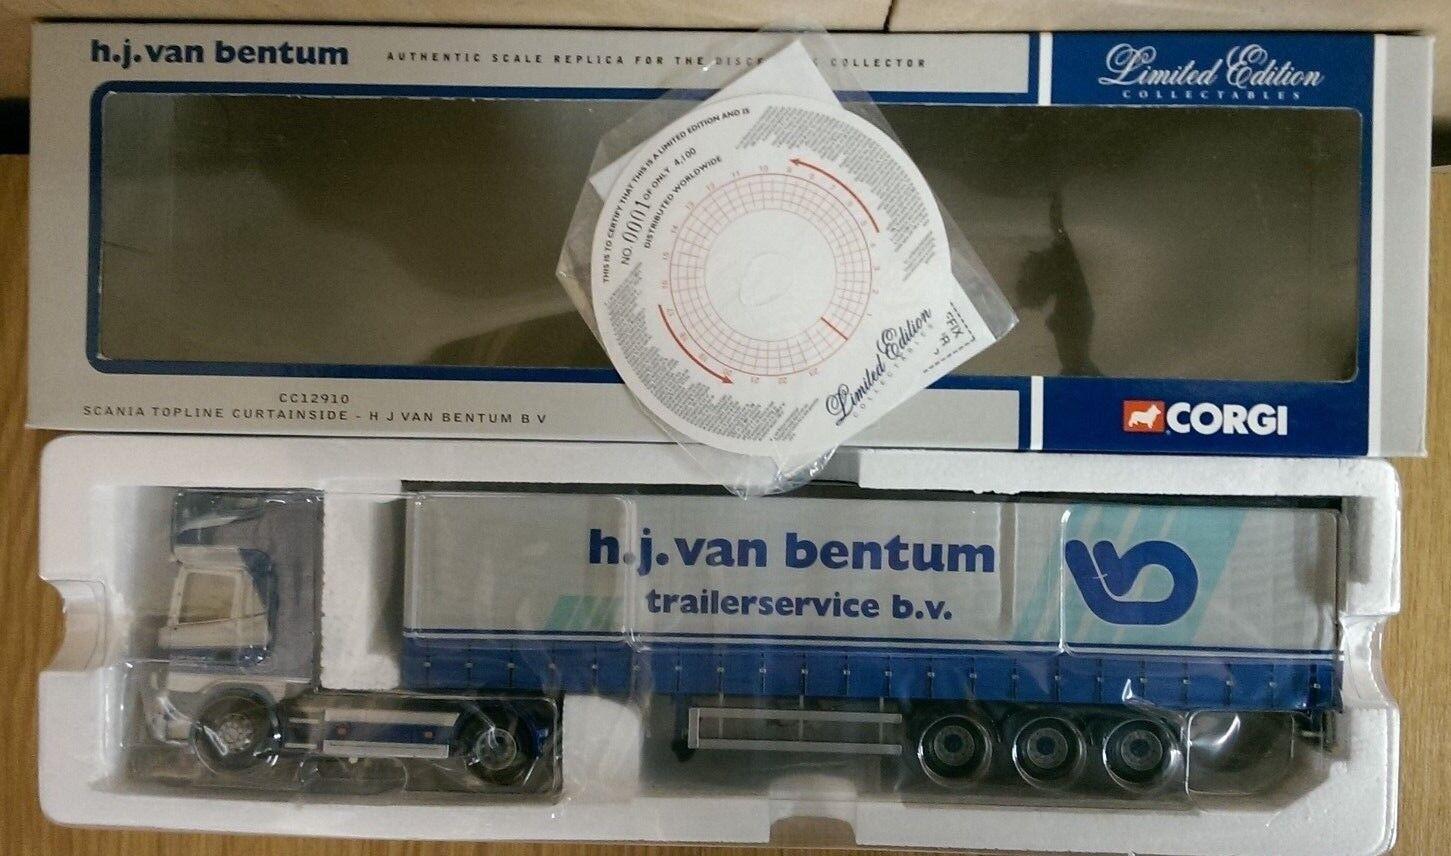 Corgi CC12910 Scania Topline Curtainside H.J. Van Bentum Ltd Ed No. 0001 of 4100